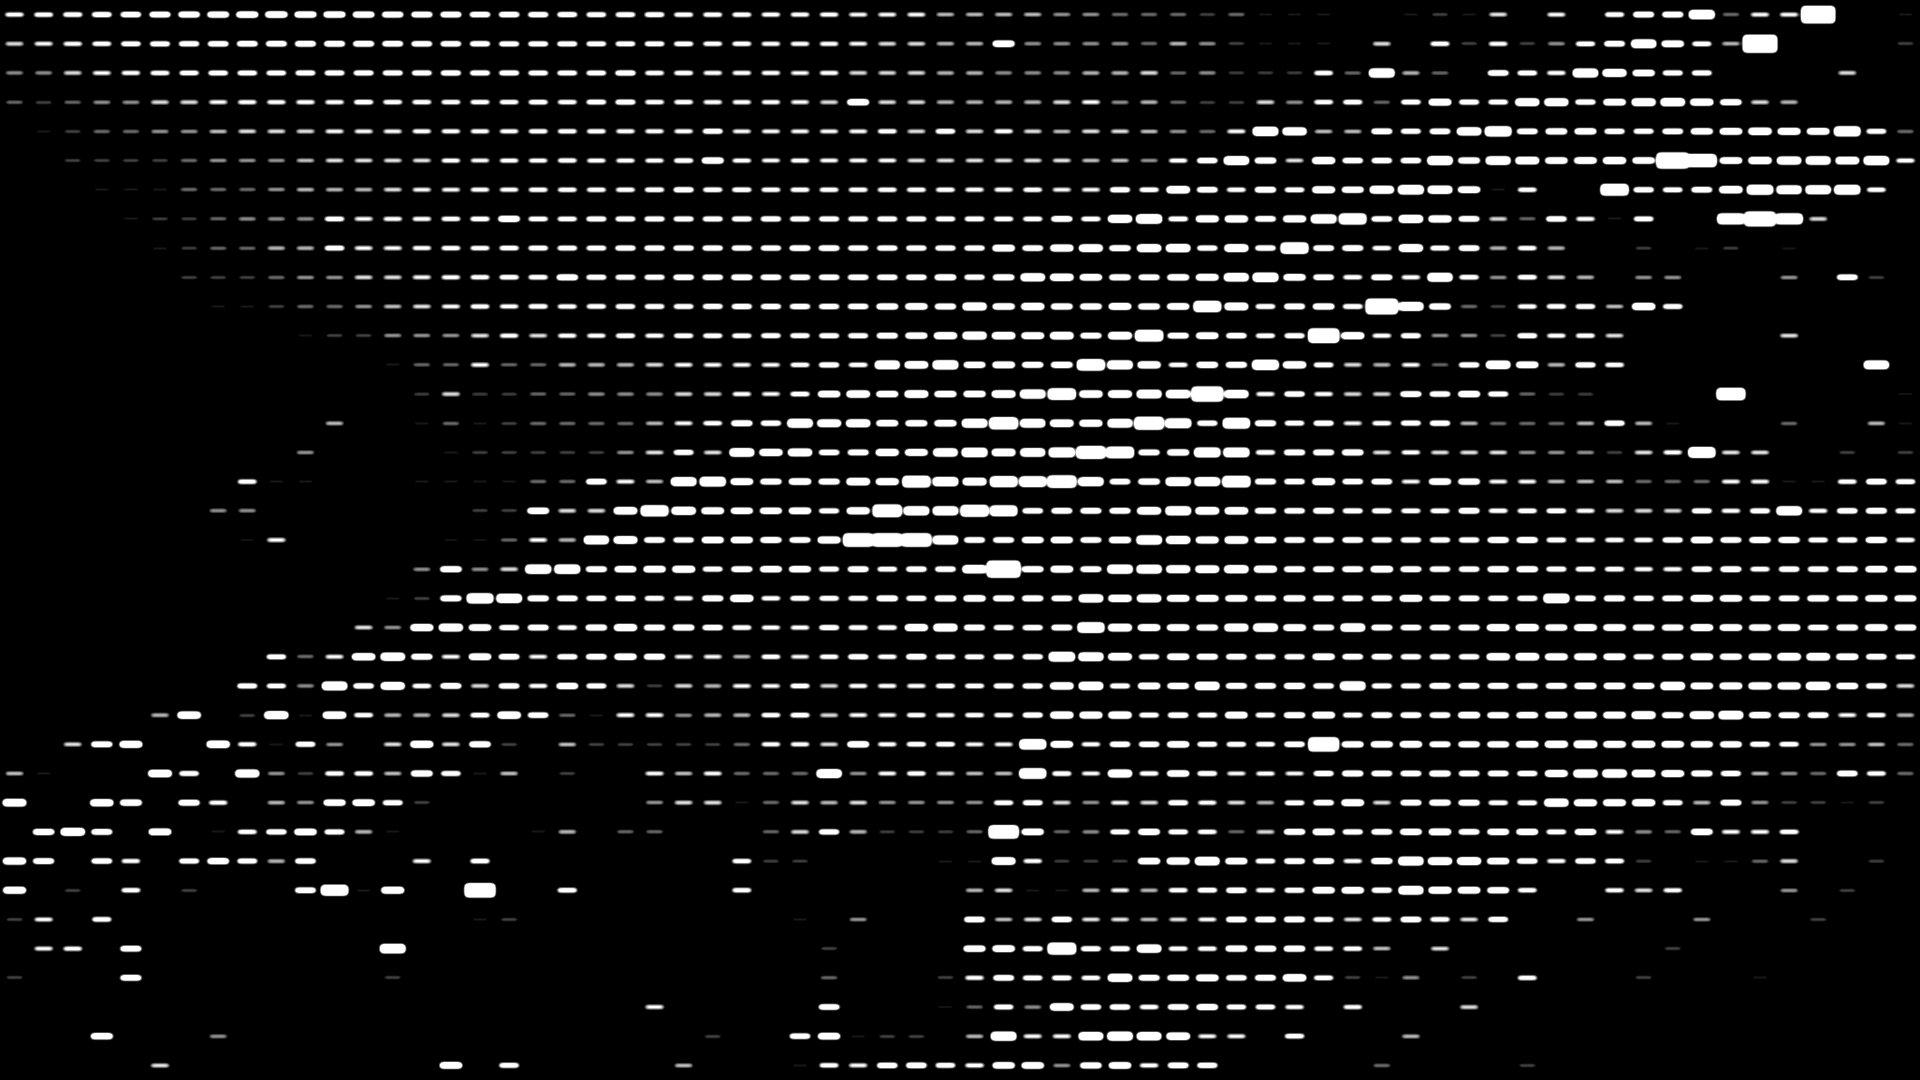 halftone particles experiments